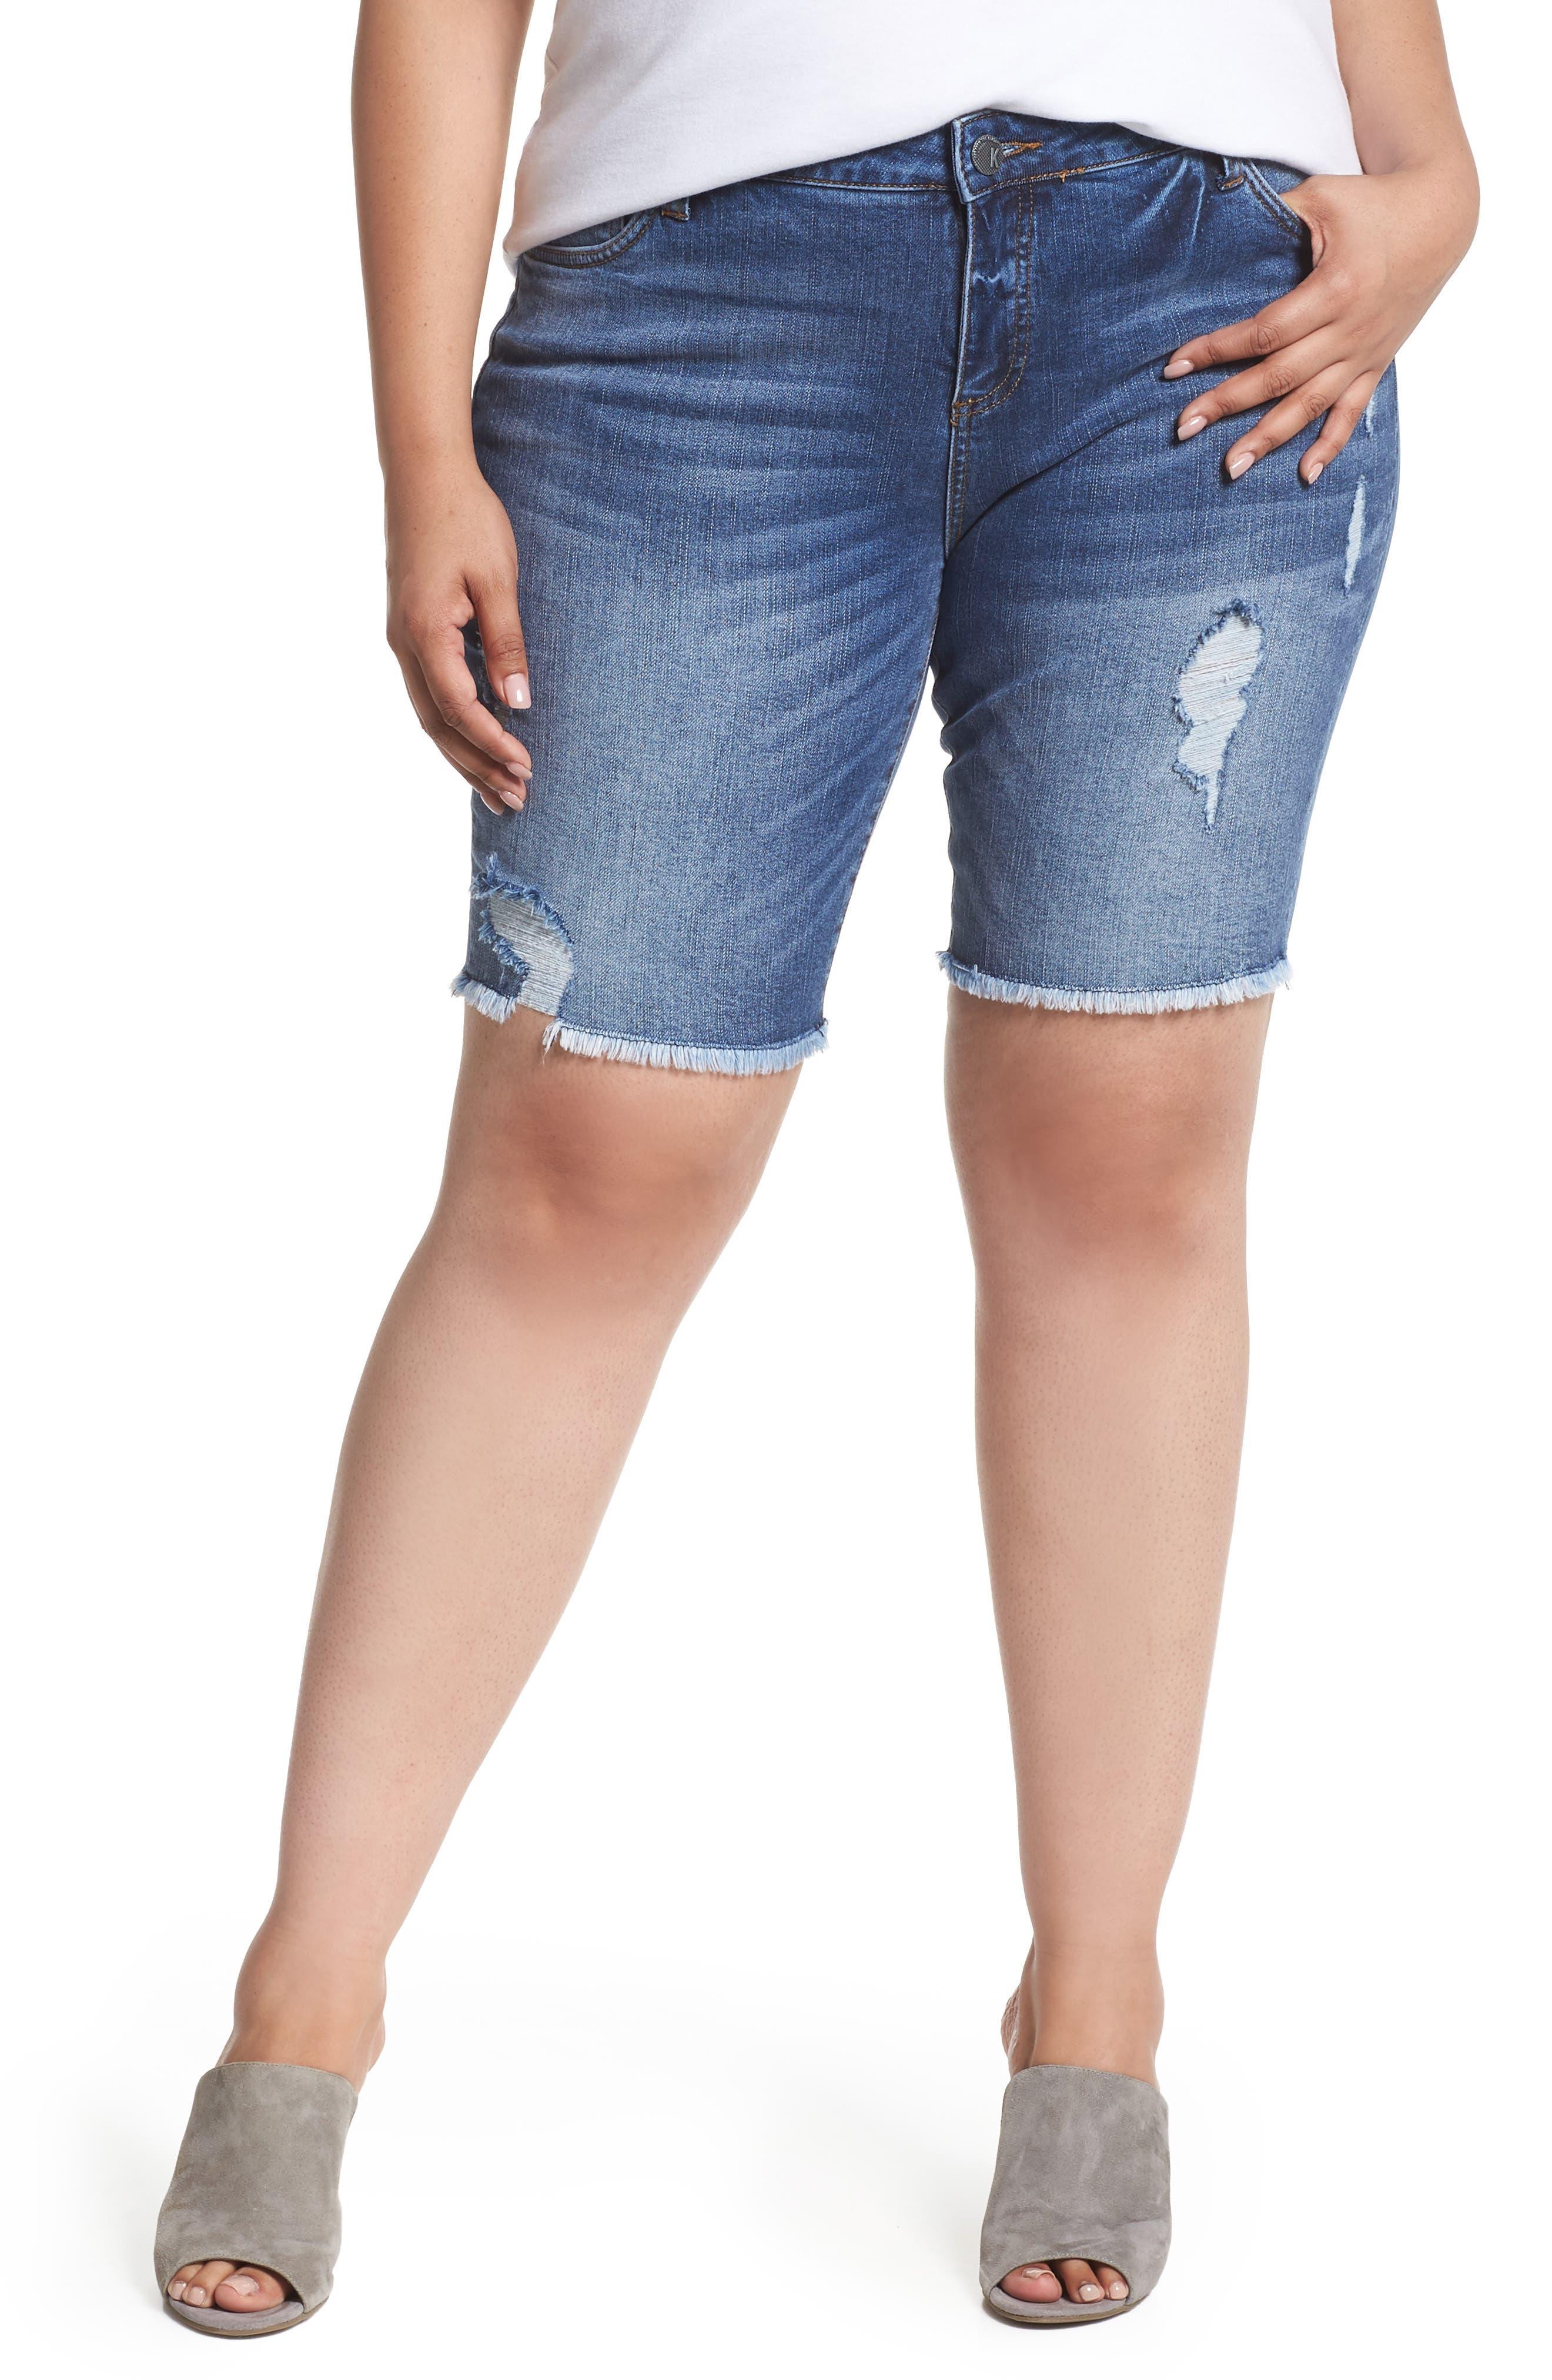 Plus Women's Kut From The Kloth Sophie Bermuda Shorts